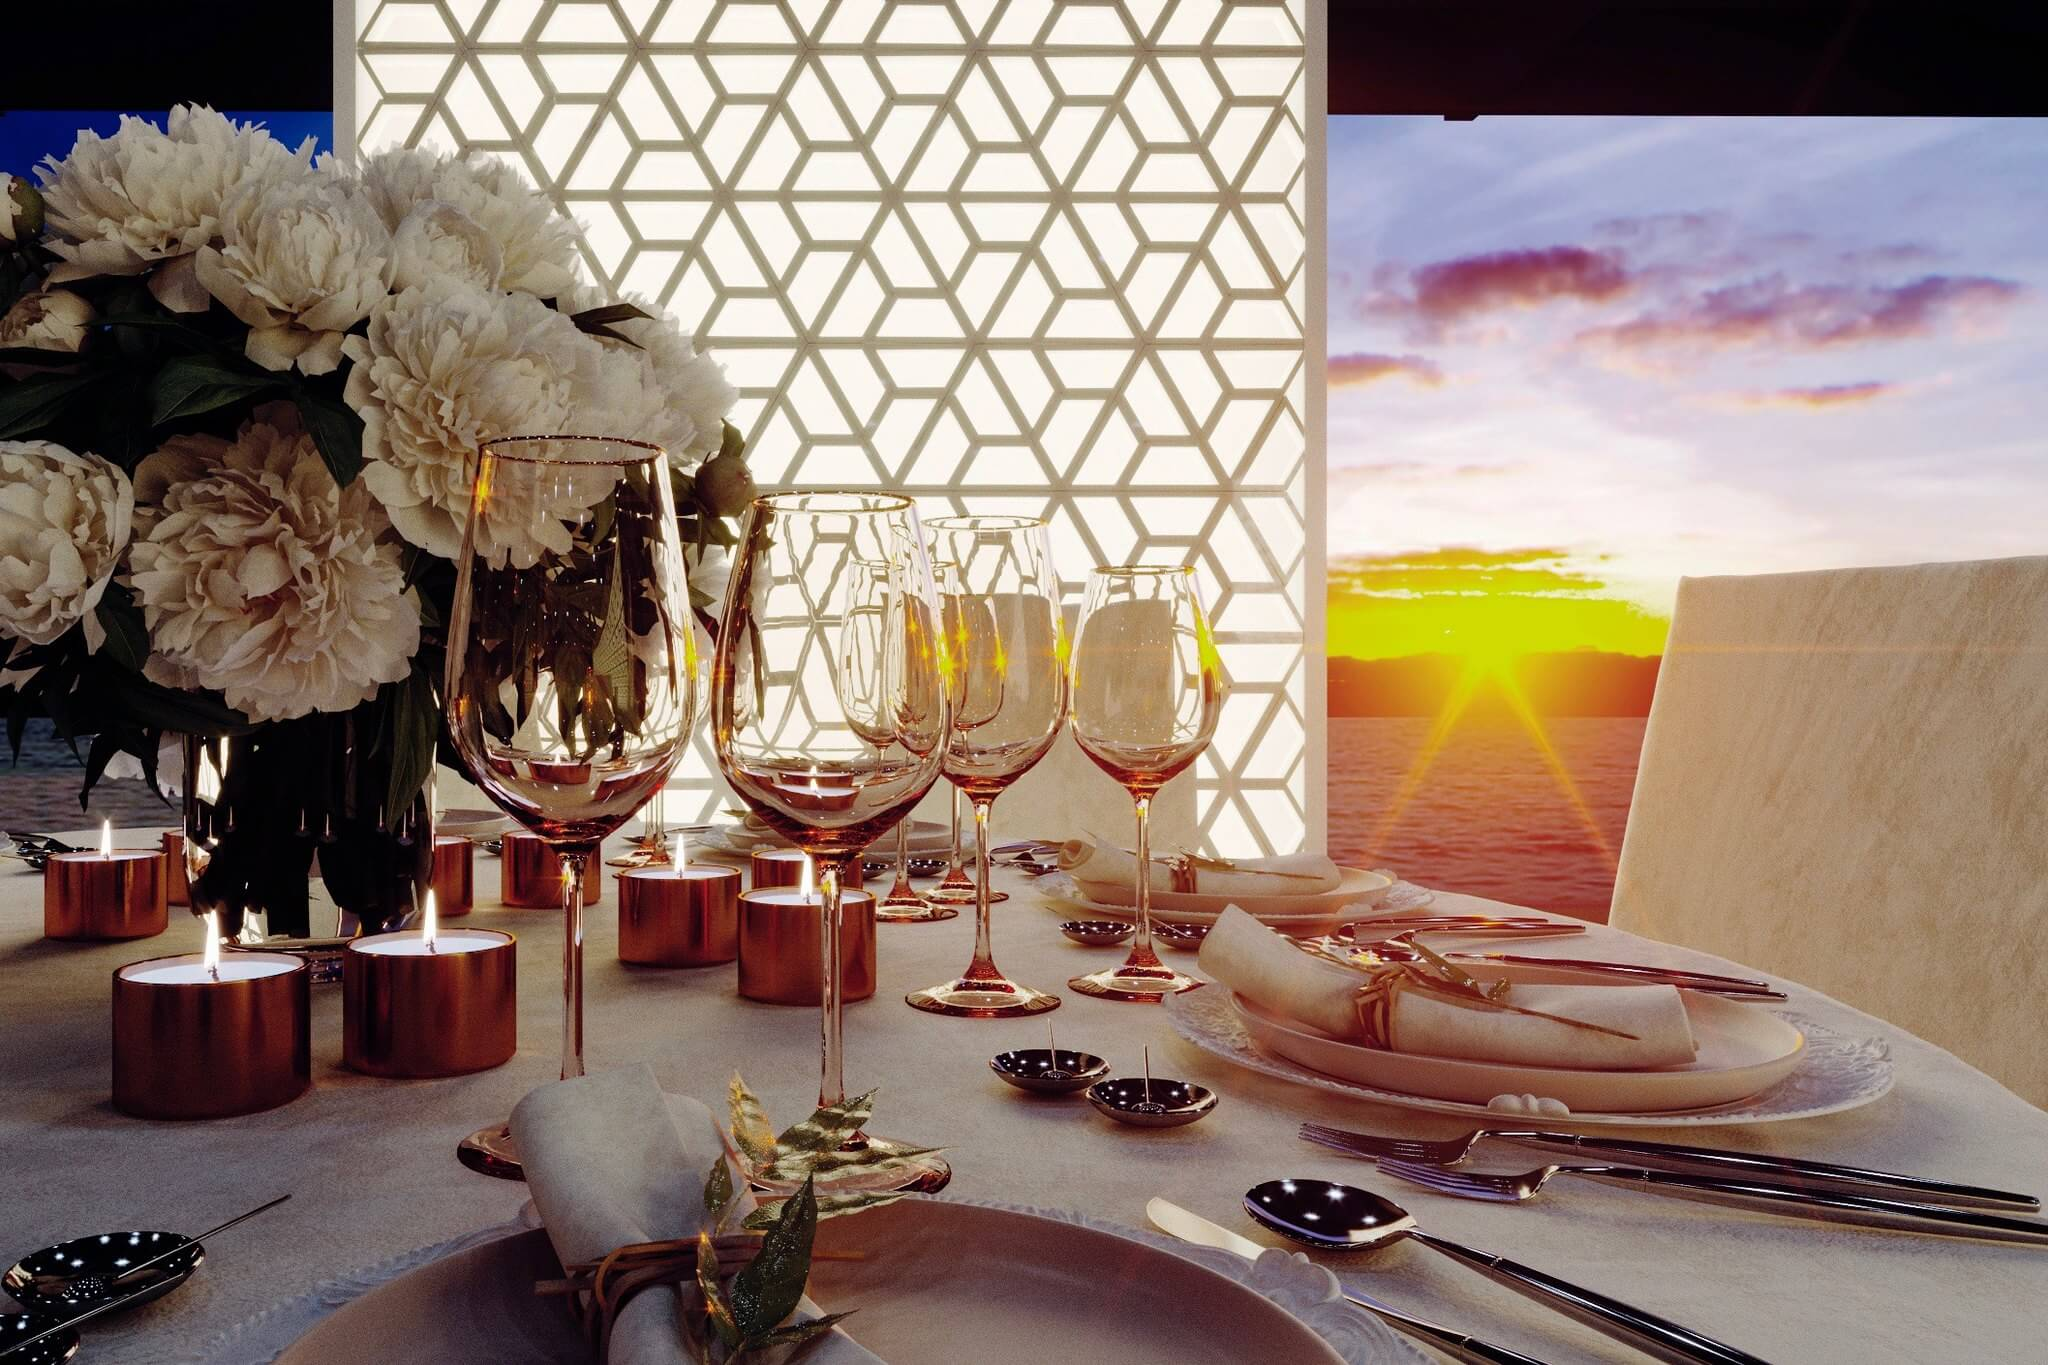 https://www.white-ibiza.com/wp-content/uploads/2020/03/ibiza-weddings-aguas-de-ibiza-2020-06.jpg